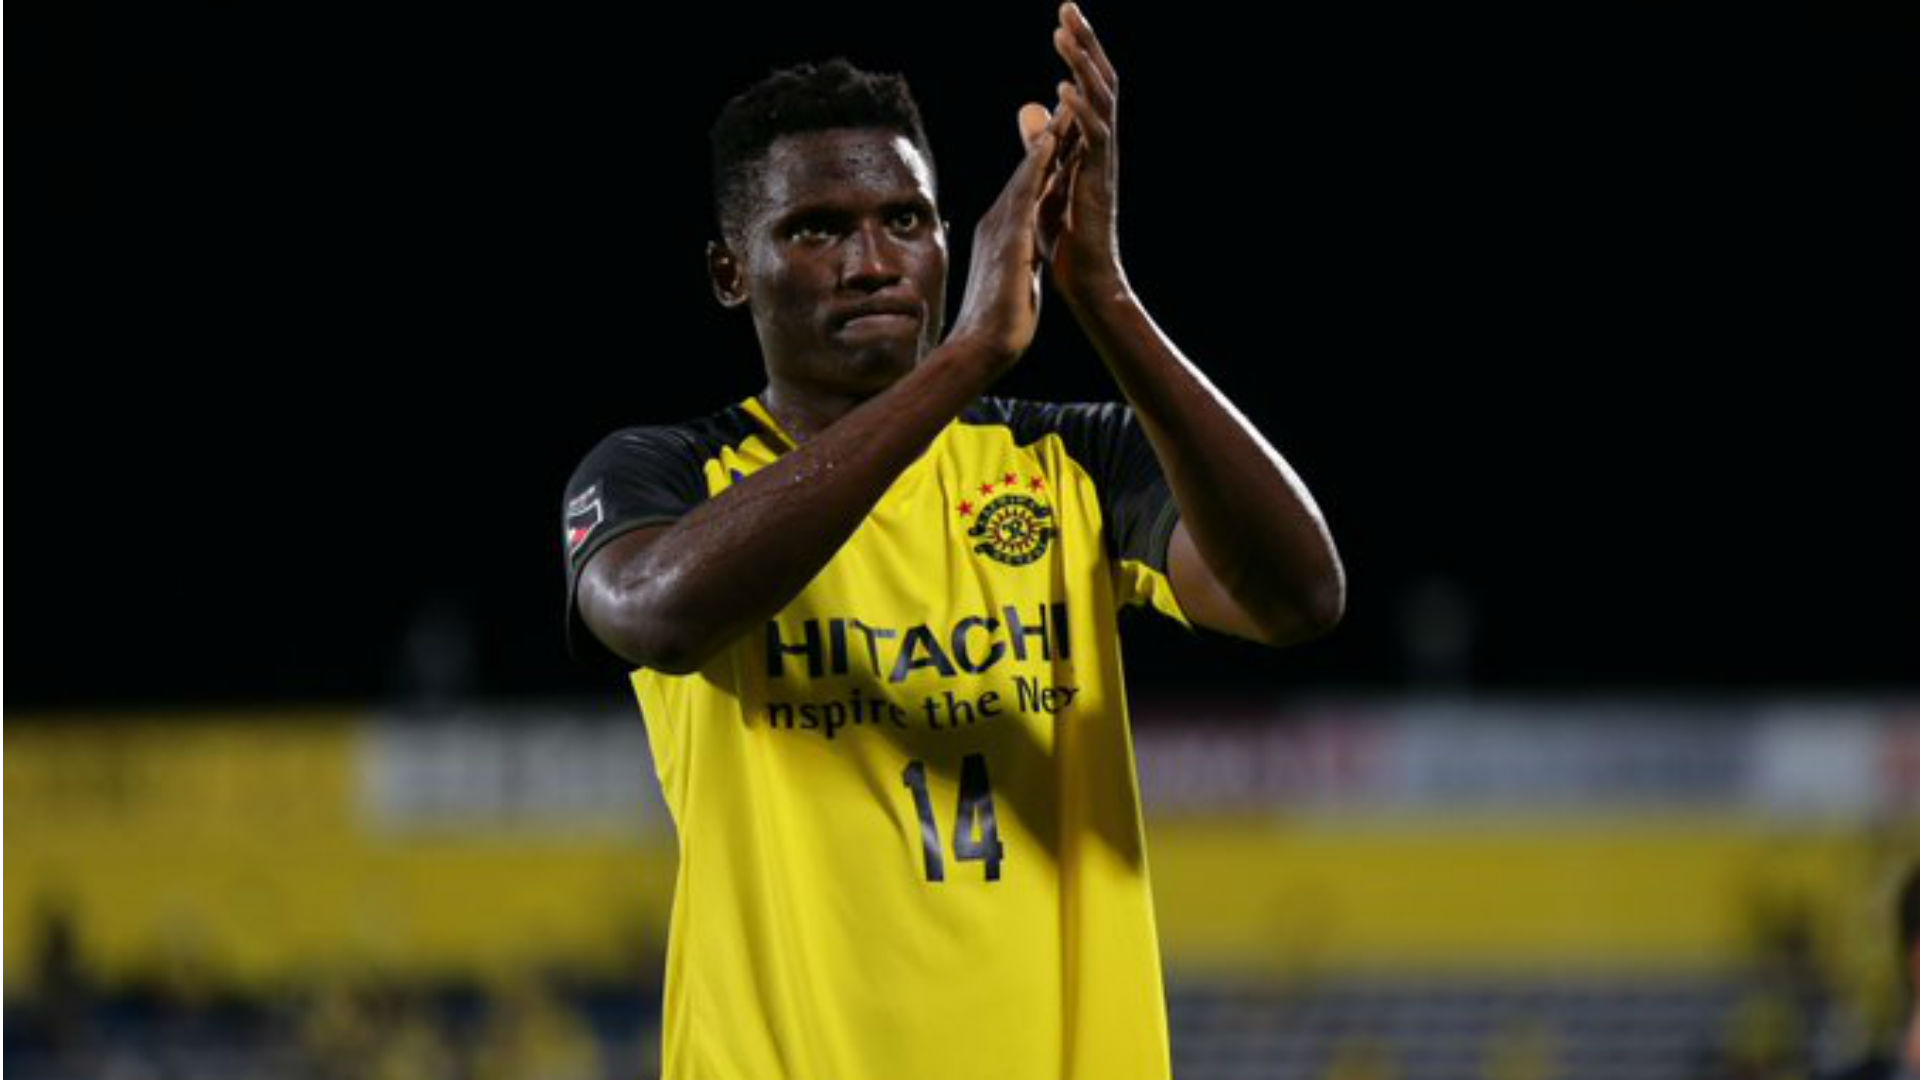 'I can still come back' – Olunga's message to Kashiwa Reysol after completing Al Duhail SC deal